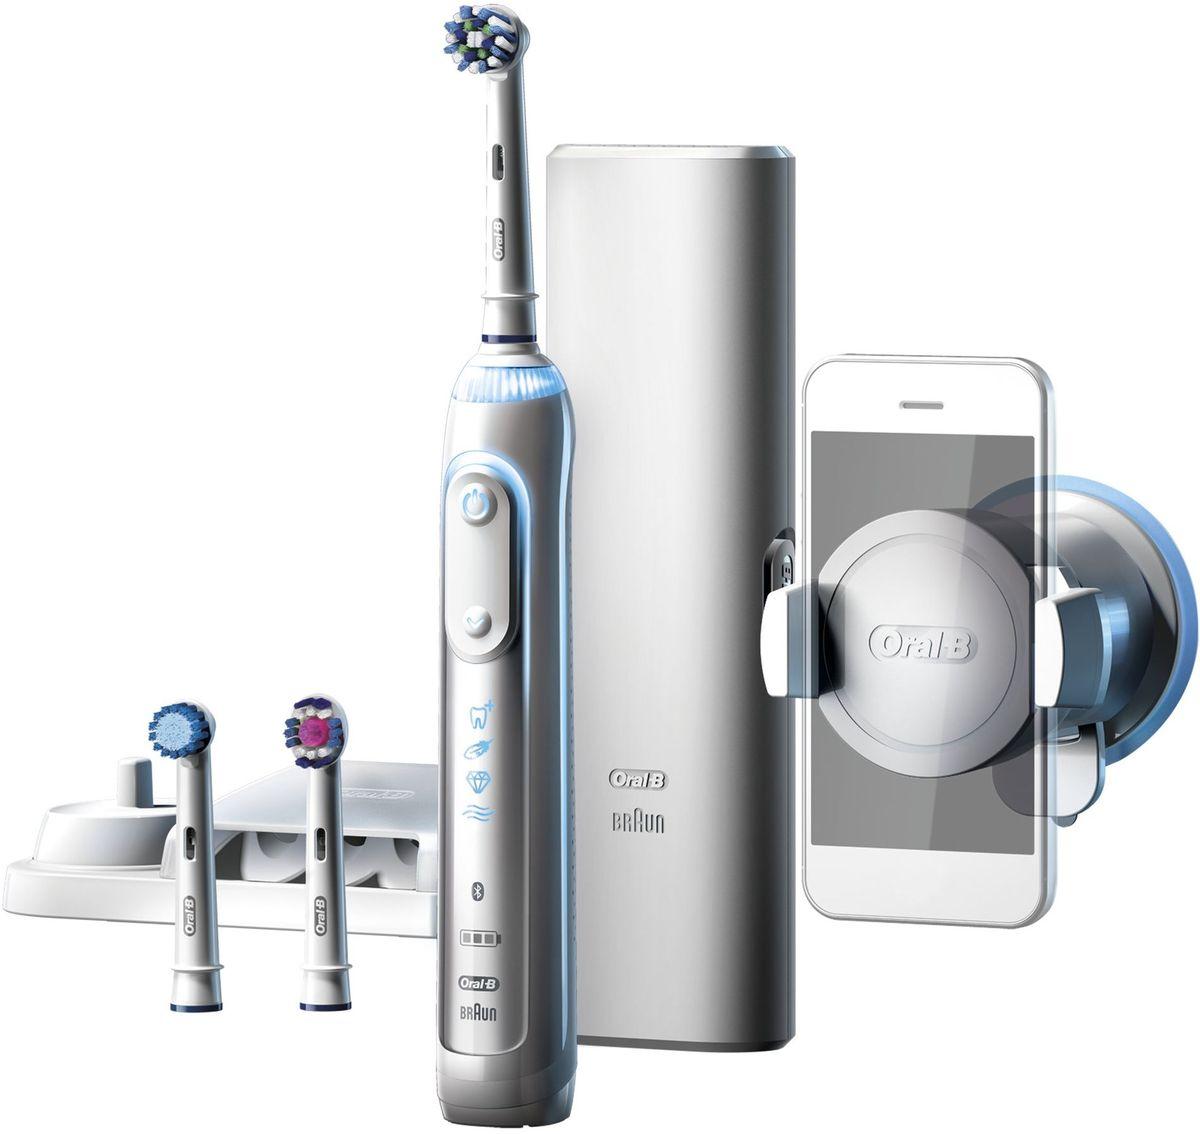 Oral-B Genius 8000, White электрическая зубная щетка - Товары для гигиены